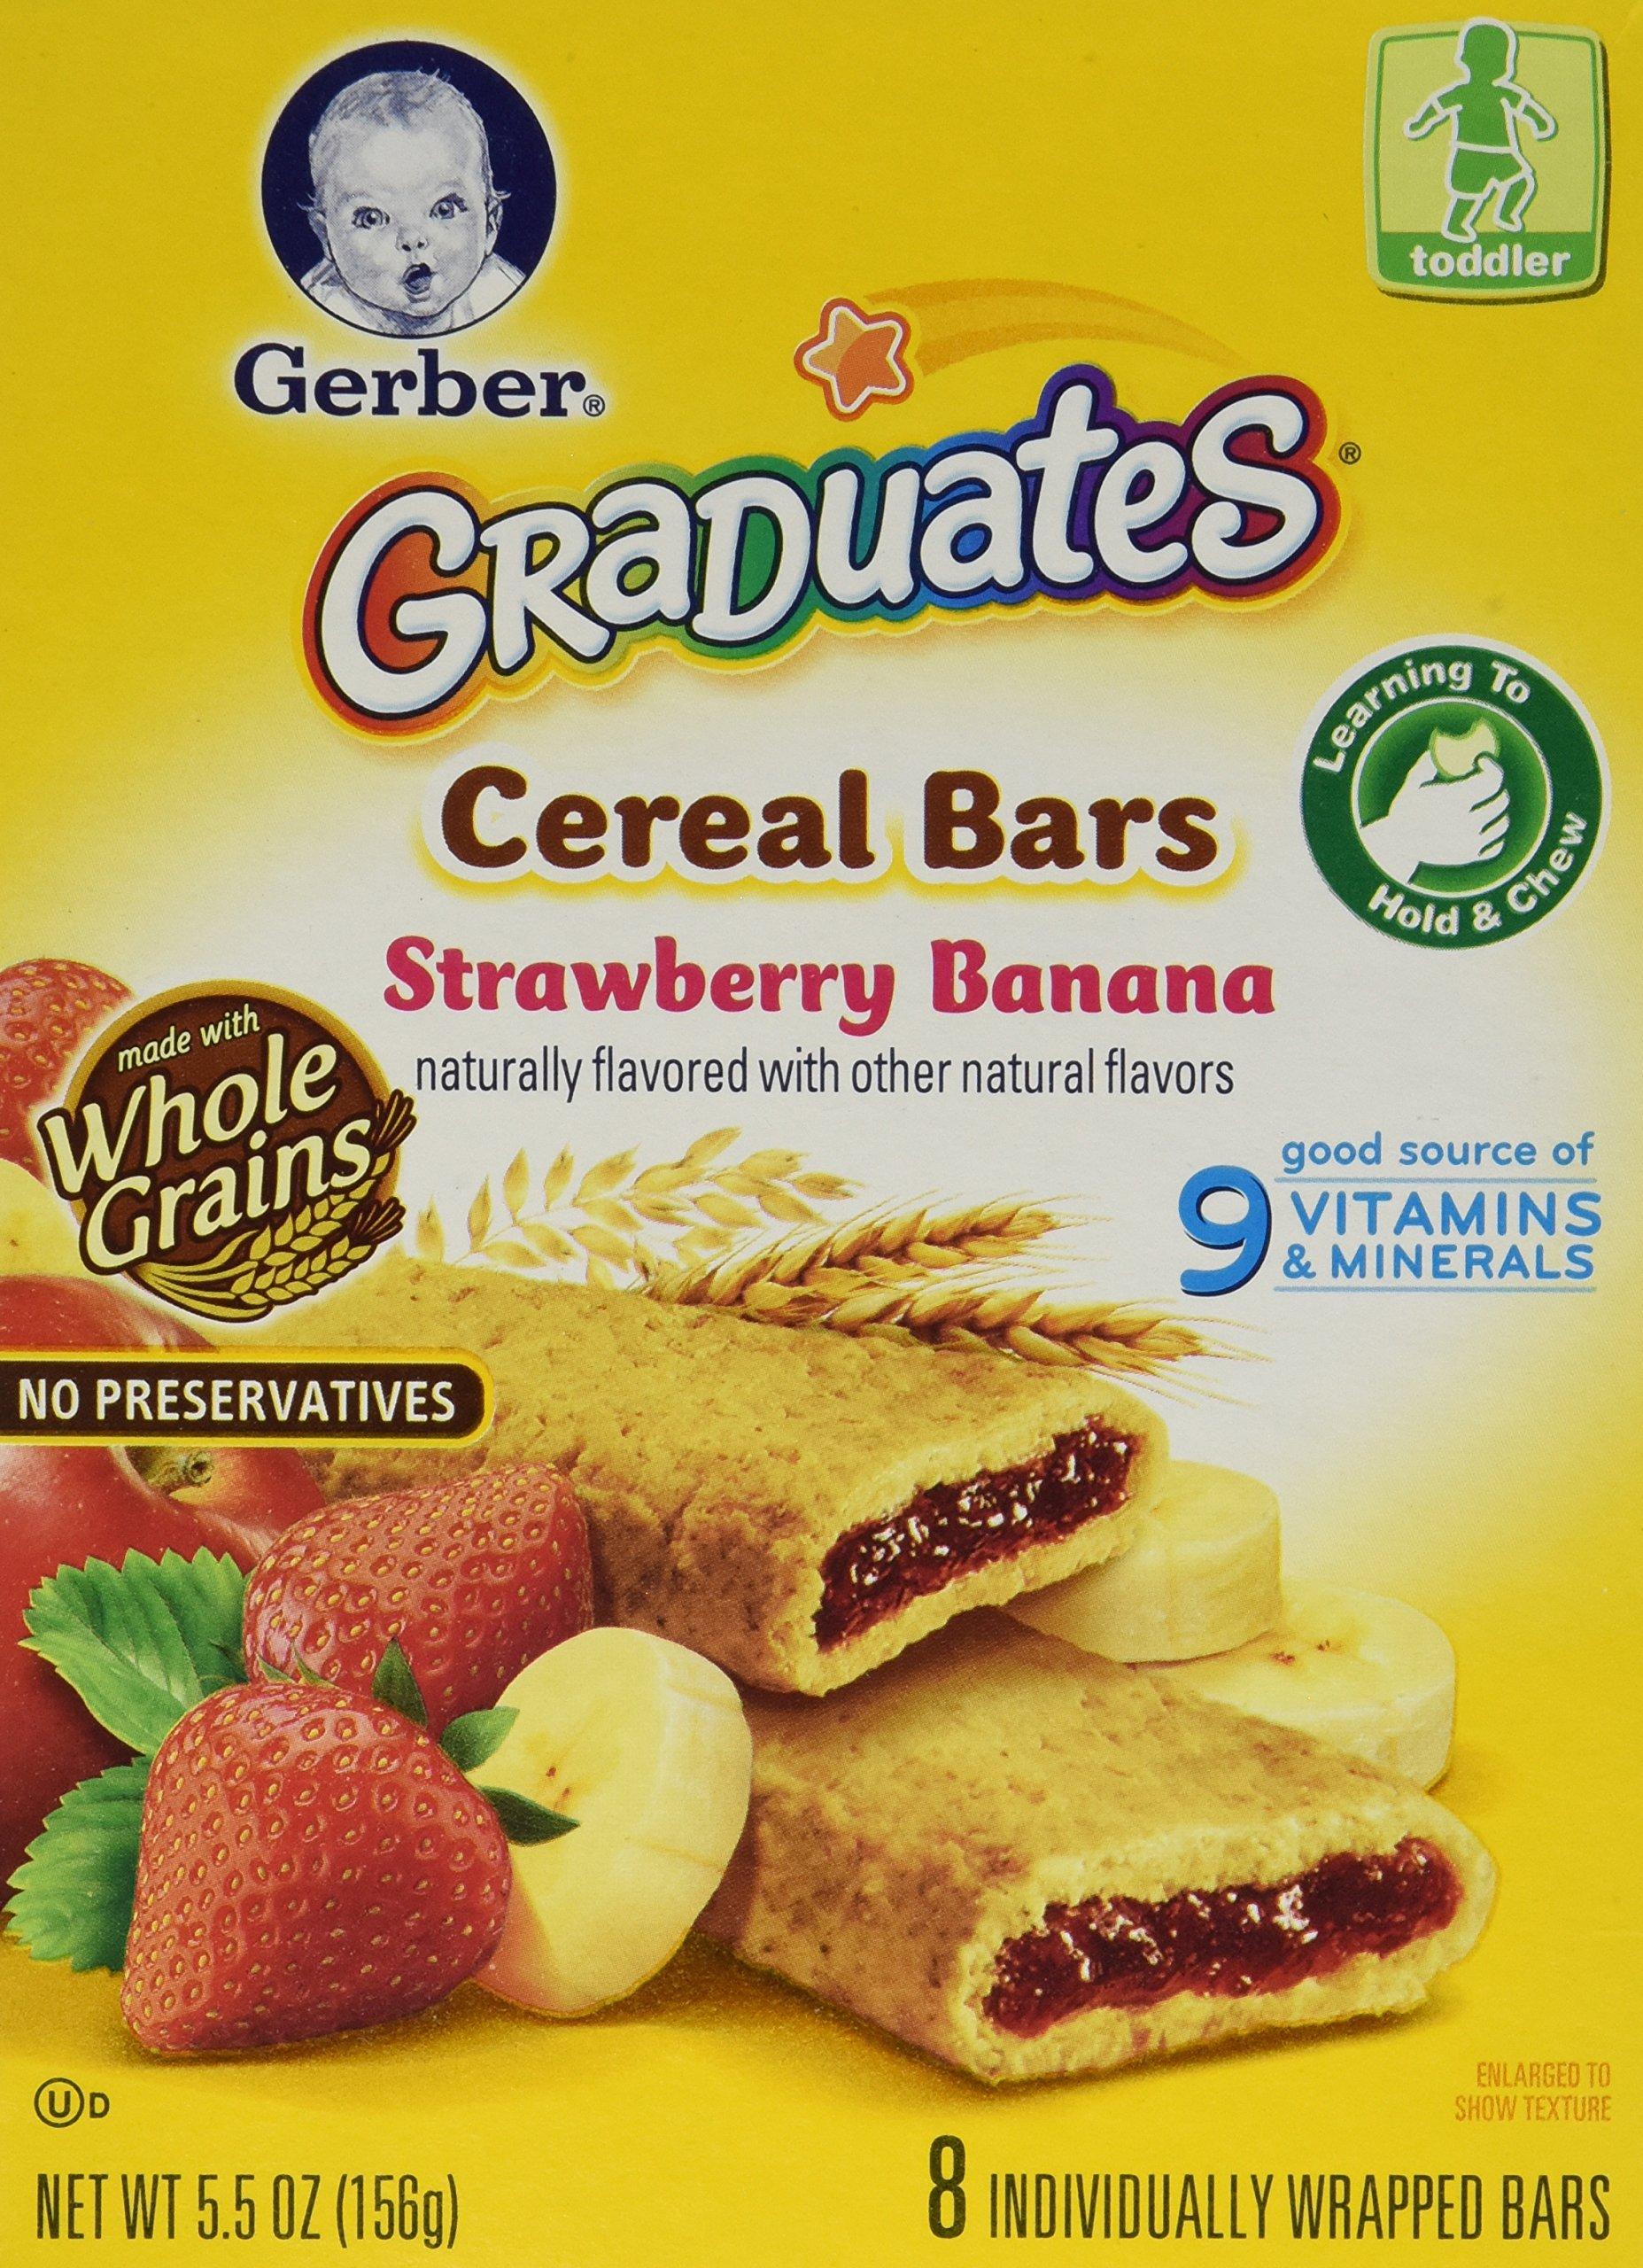 Gerber Graduates Cereal Bars STRAWBERRY BANANA - 5.5oz. (Pack of 4)